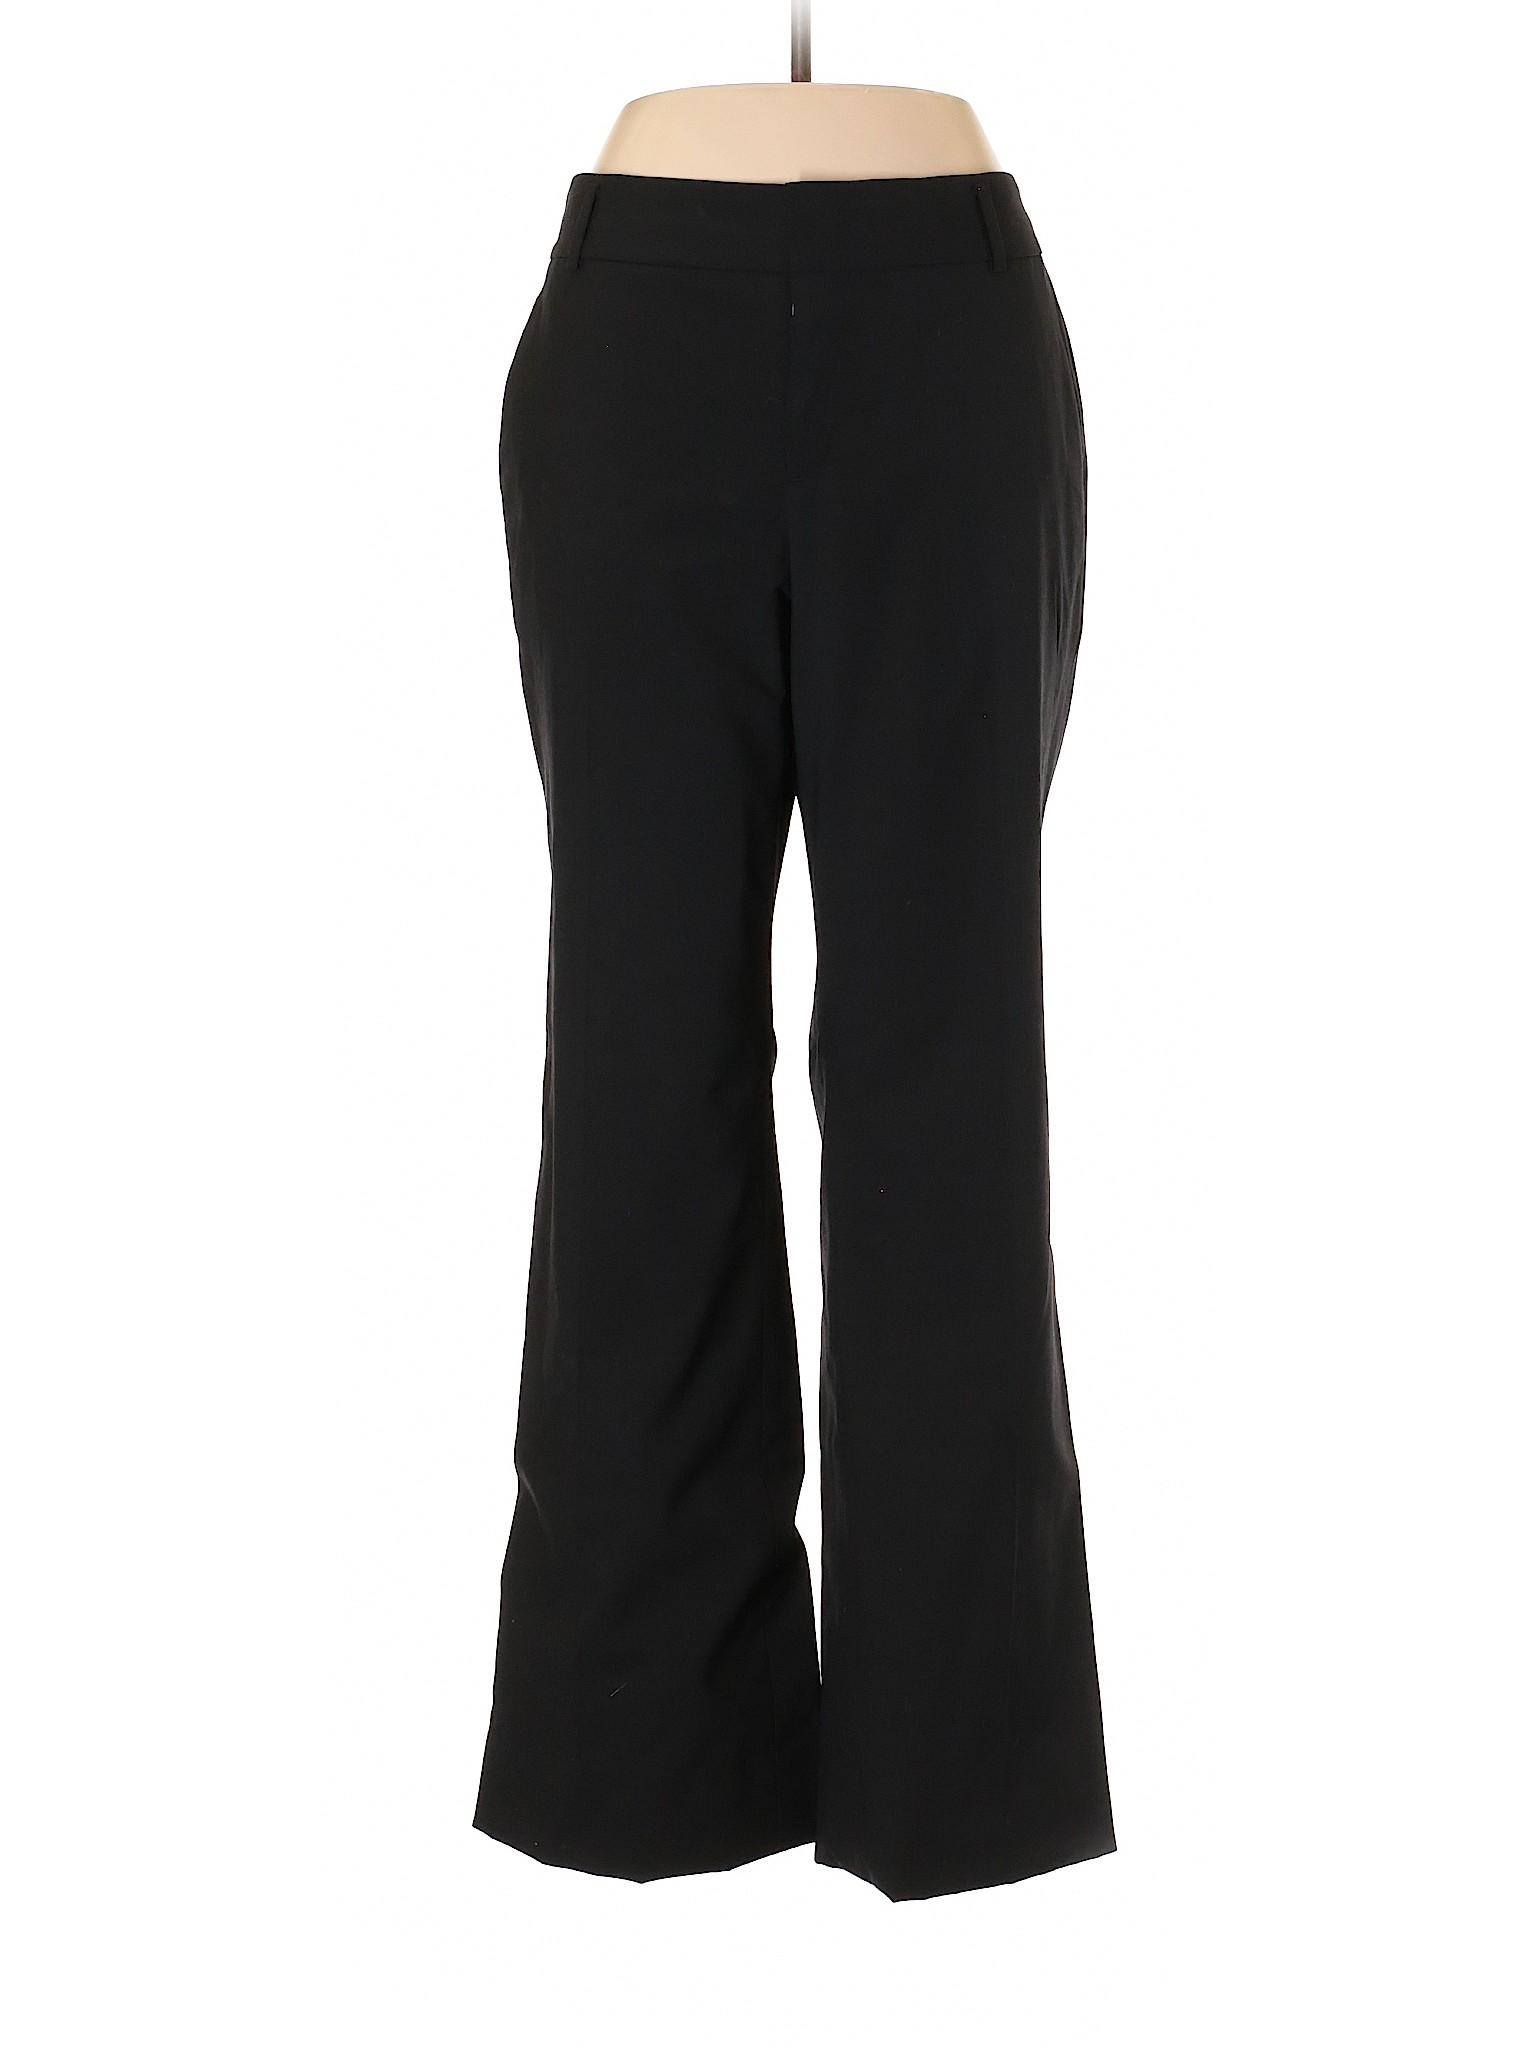 winter Pants Boutique Wool Banana Republic AgxwdwTq4